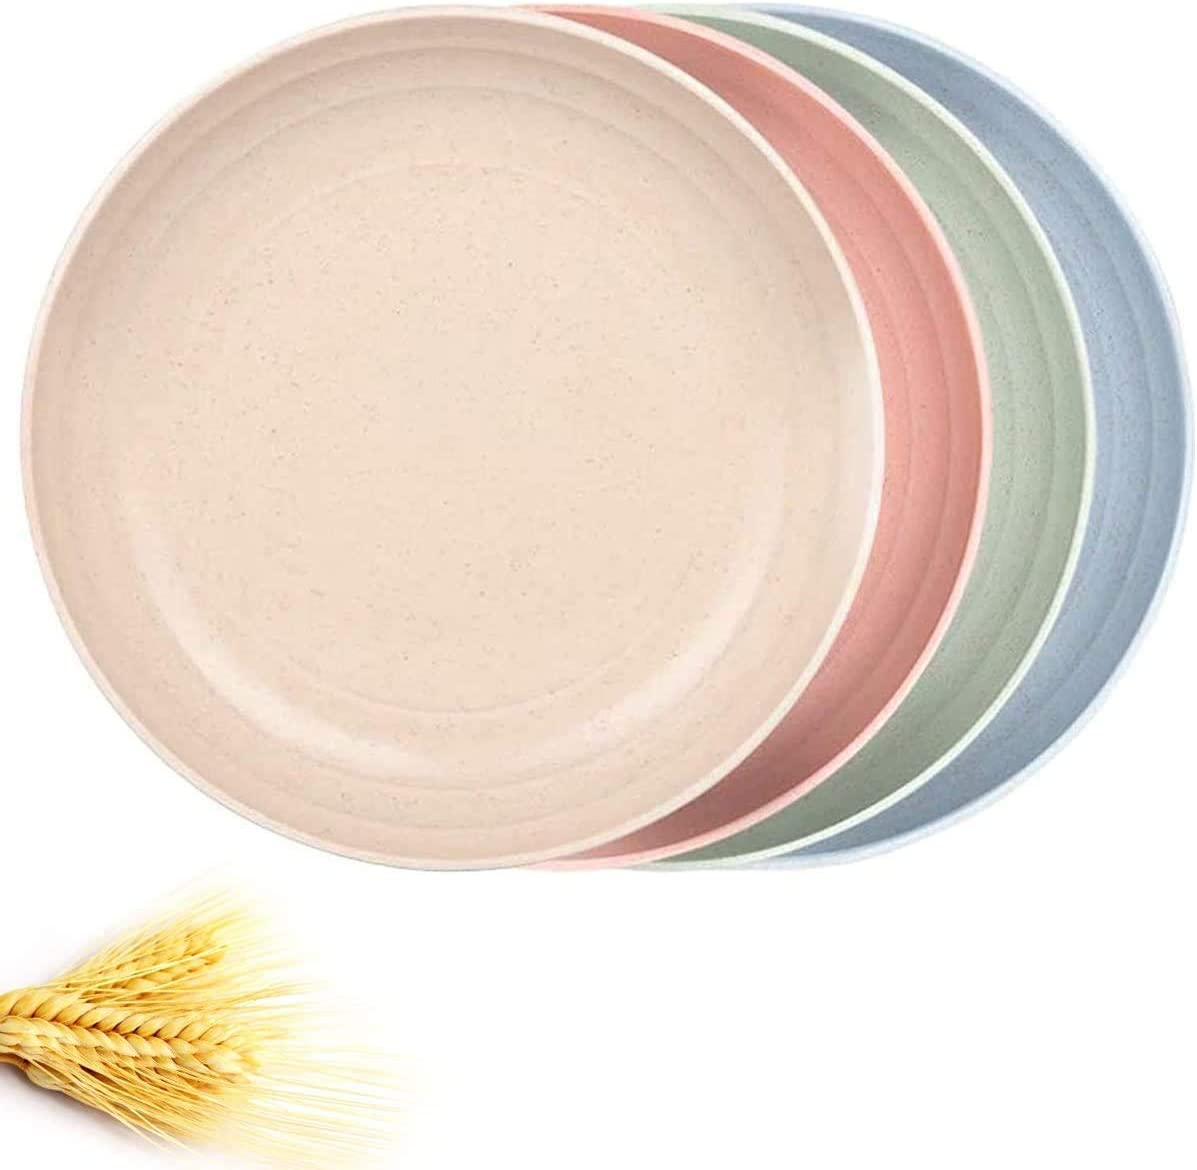 Cereal Plates Large, 10 Inch Dishes Fruit Dish, Wheat Straw Fiber Plates Sets 4, Dishwasher & Microwave Safe Dishes for Cereal, Salad, Noodle, Rice, Veggie, Dessert, Snack, Kitchen Dining Dinnerware